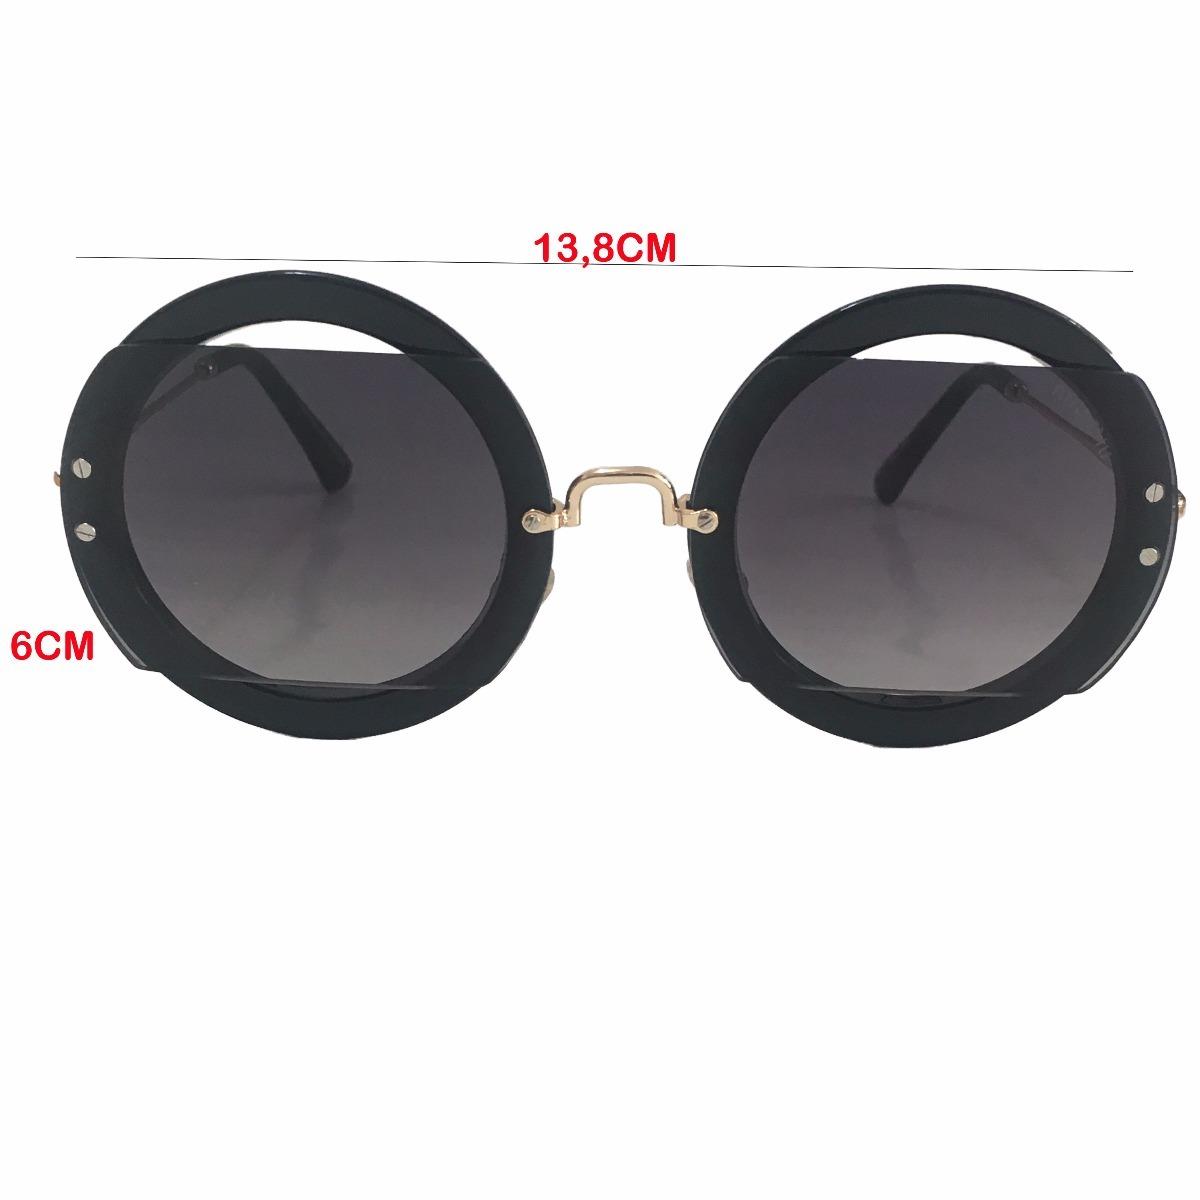 963f428ca9f6f óculos de sol 06ss -pronta entrega qualidade boa. Carregando zoom.